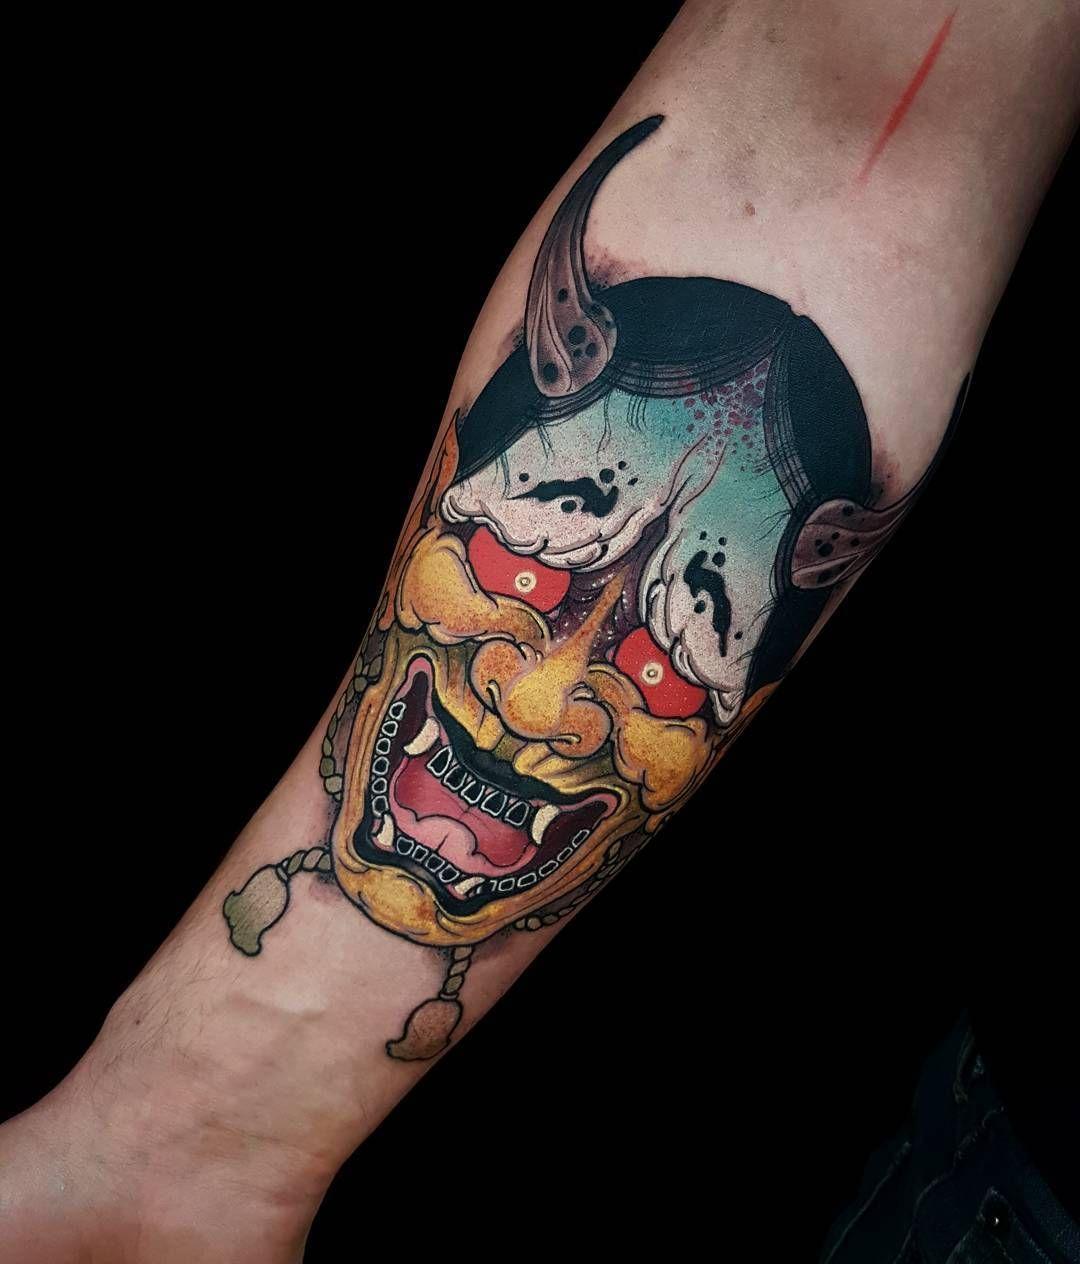 Badass scary Hannya mask tattoo idea for boys Hannya